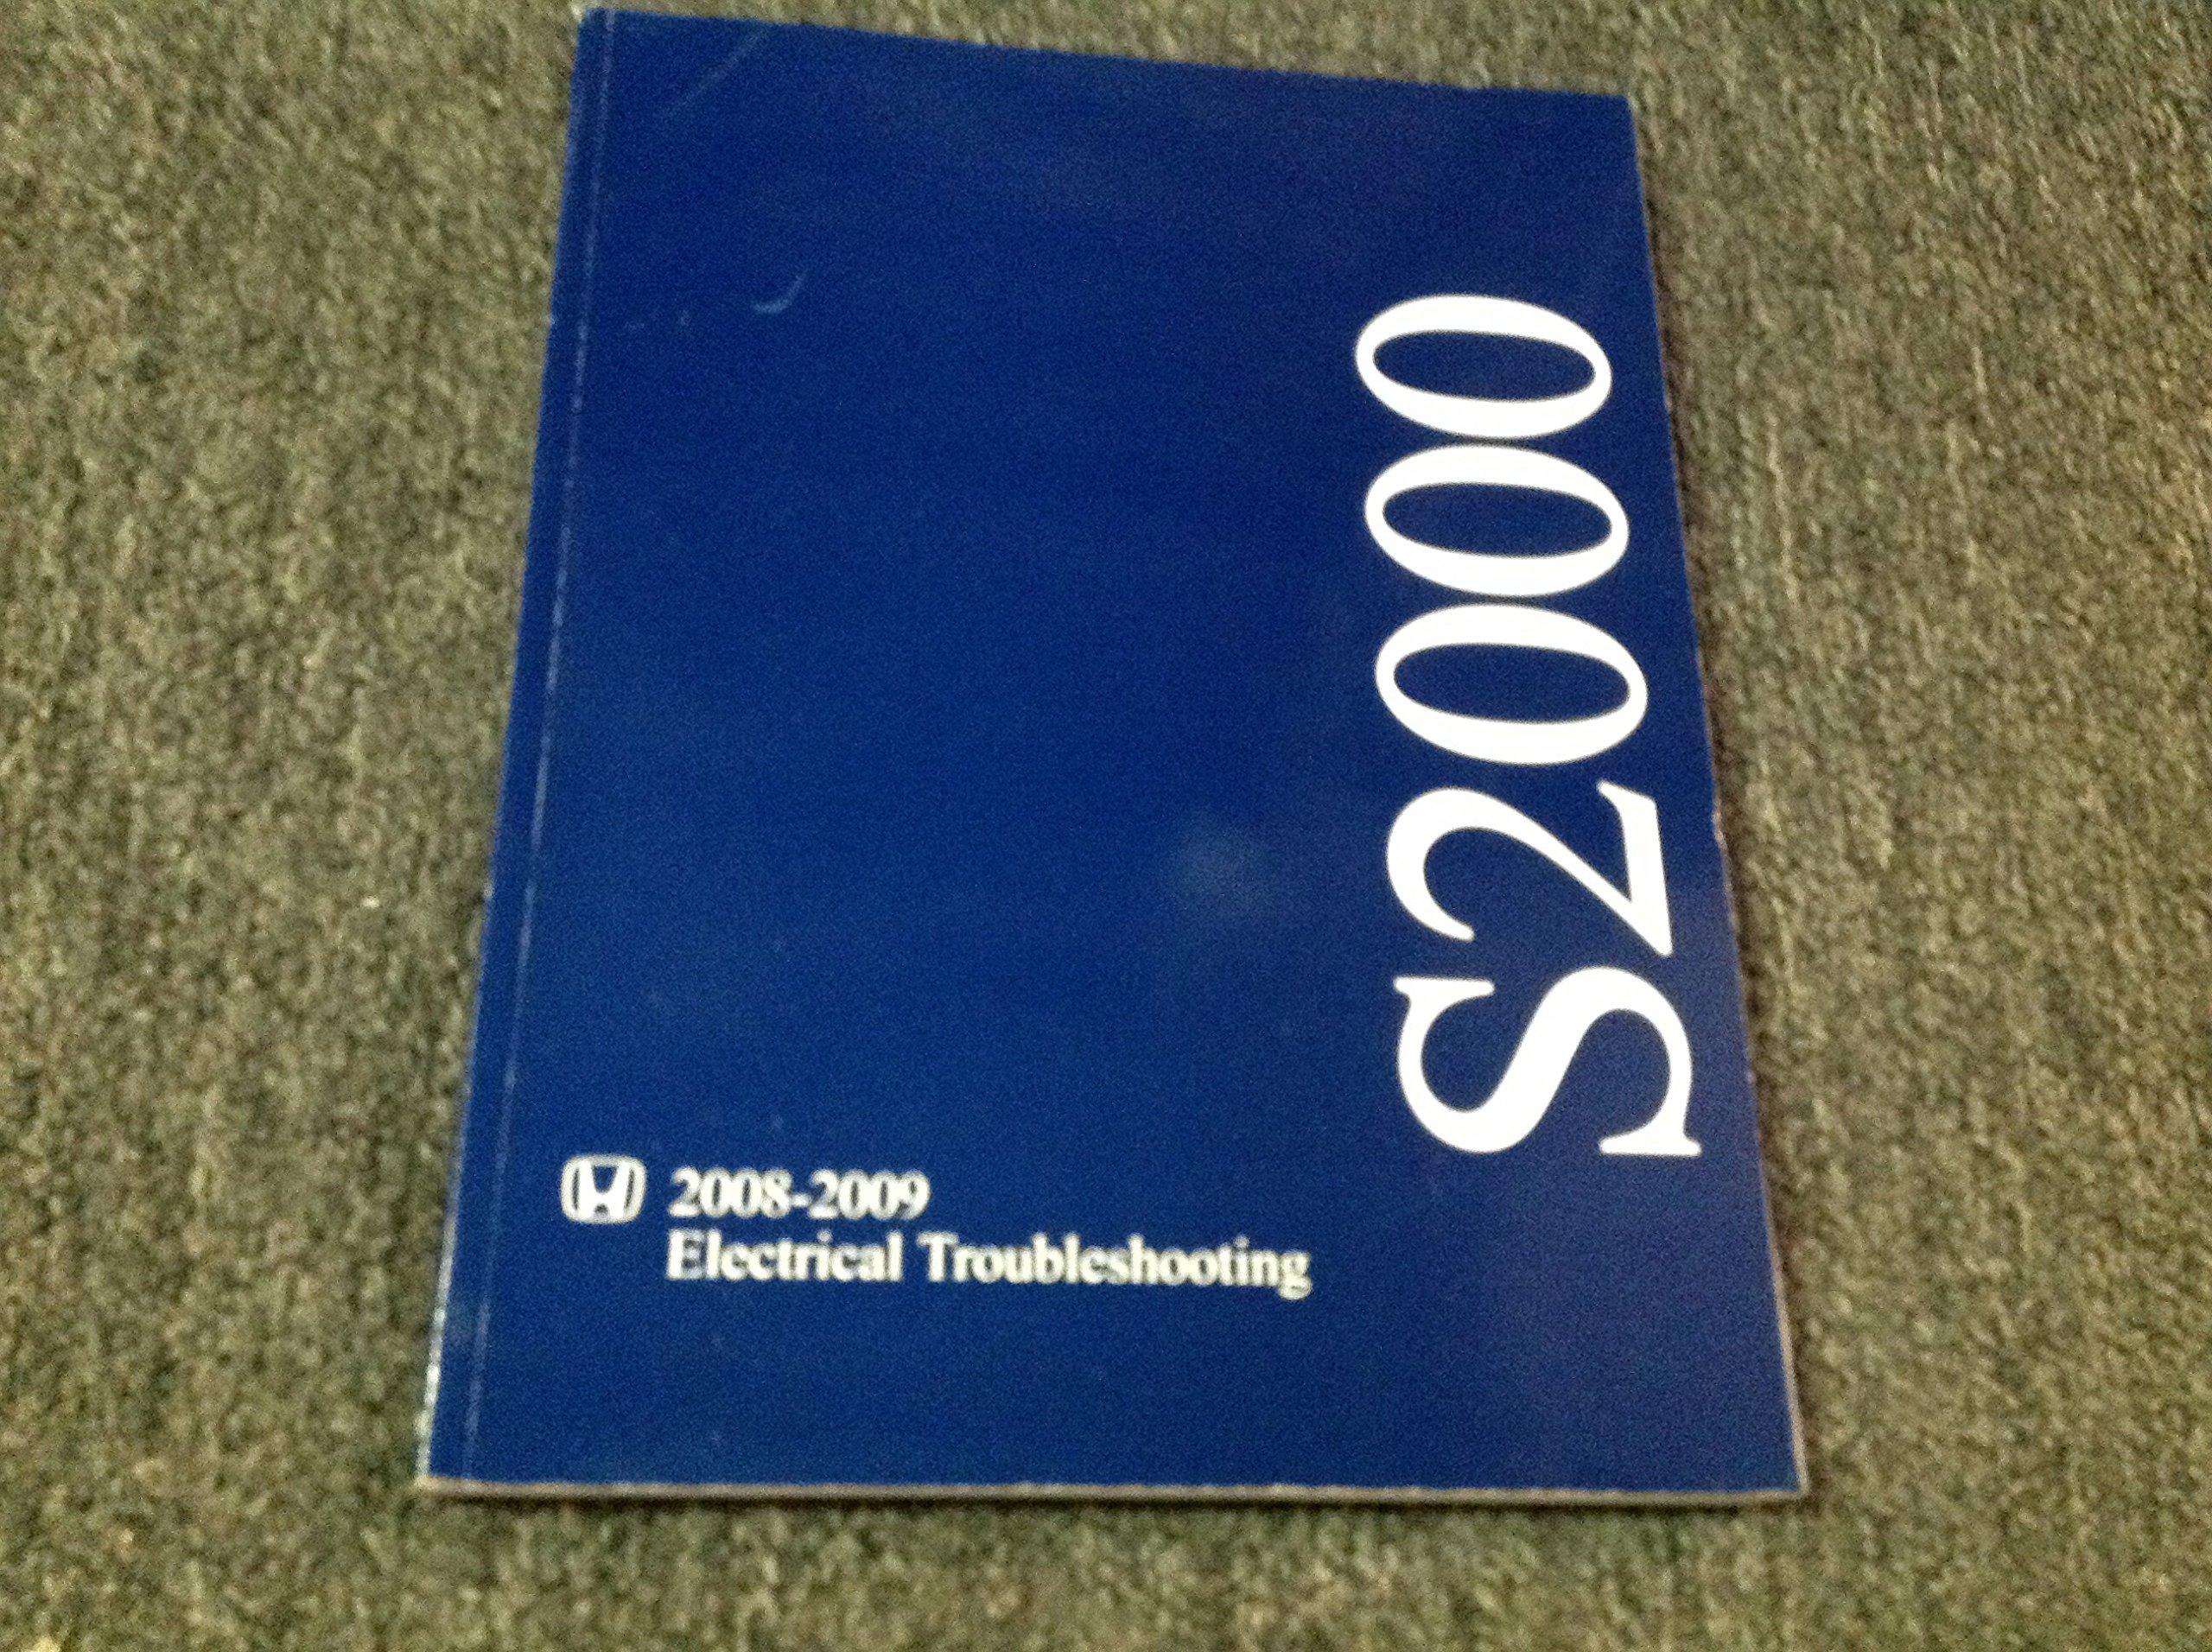 2008 2009 honda s2000 electrical wiring diagram troubleshooting manual etm  oem paperback – 2009